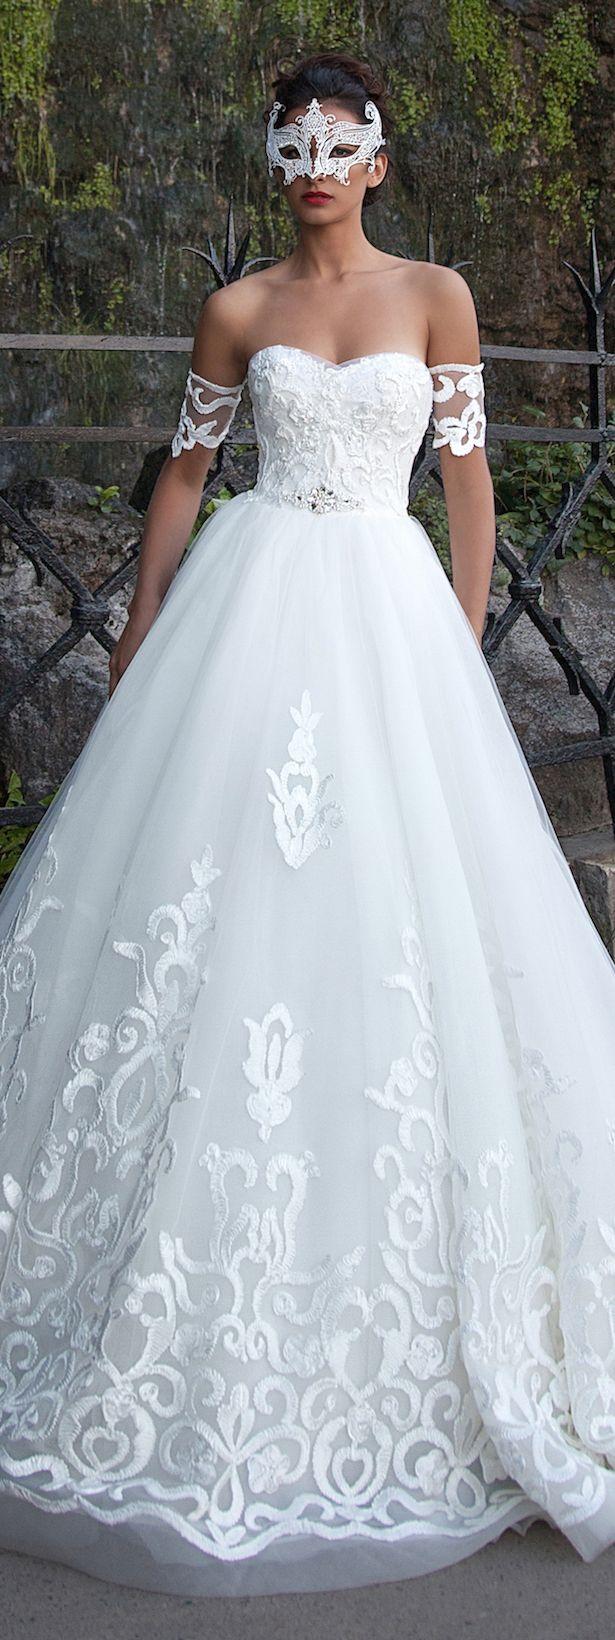 233 best Wedding dresses images on Pinterest | Wedding frocks ...